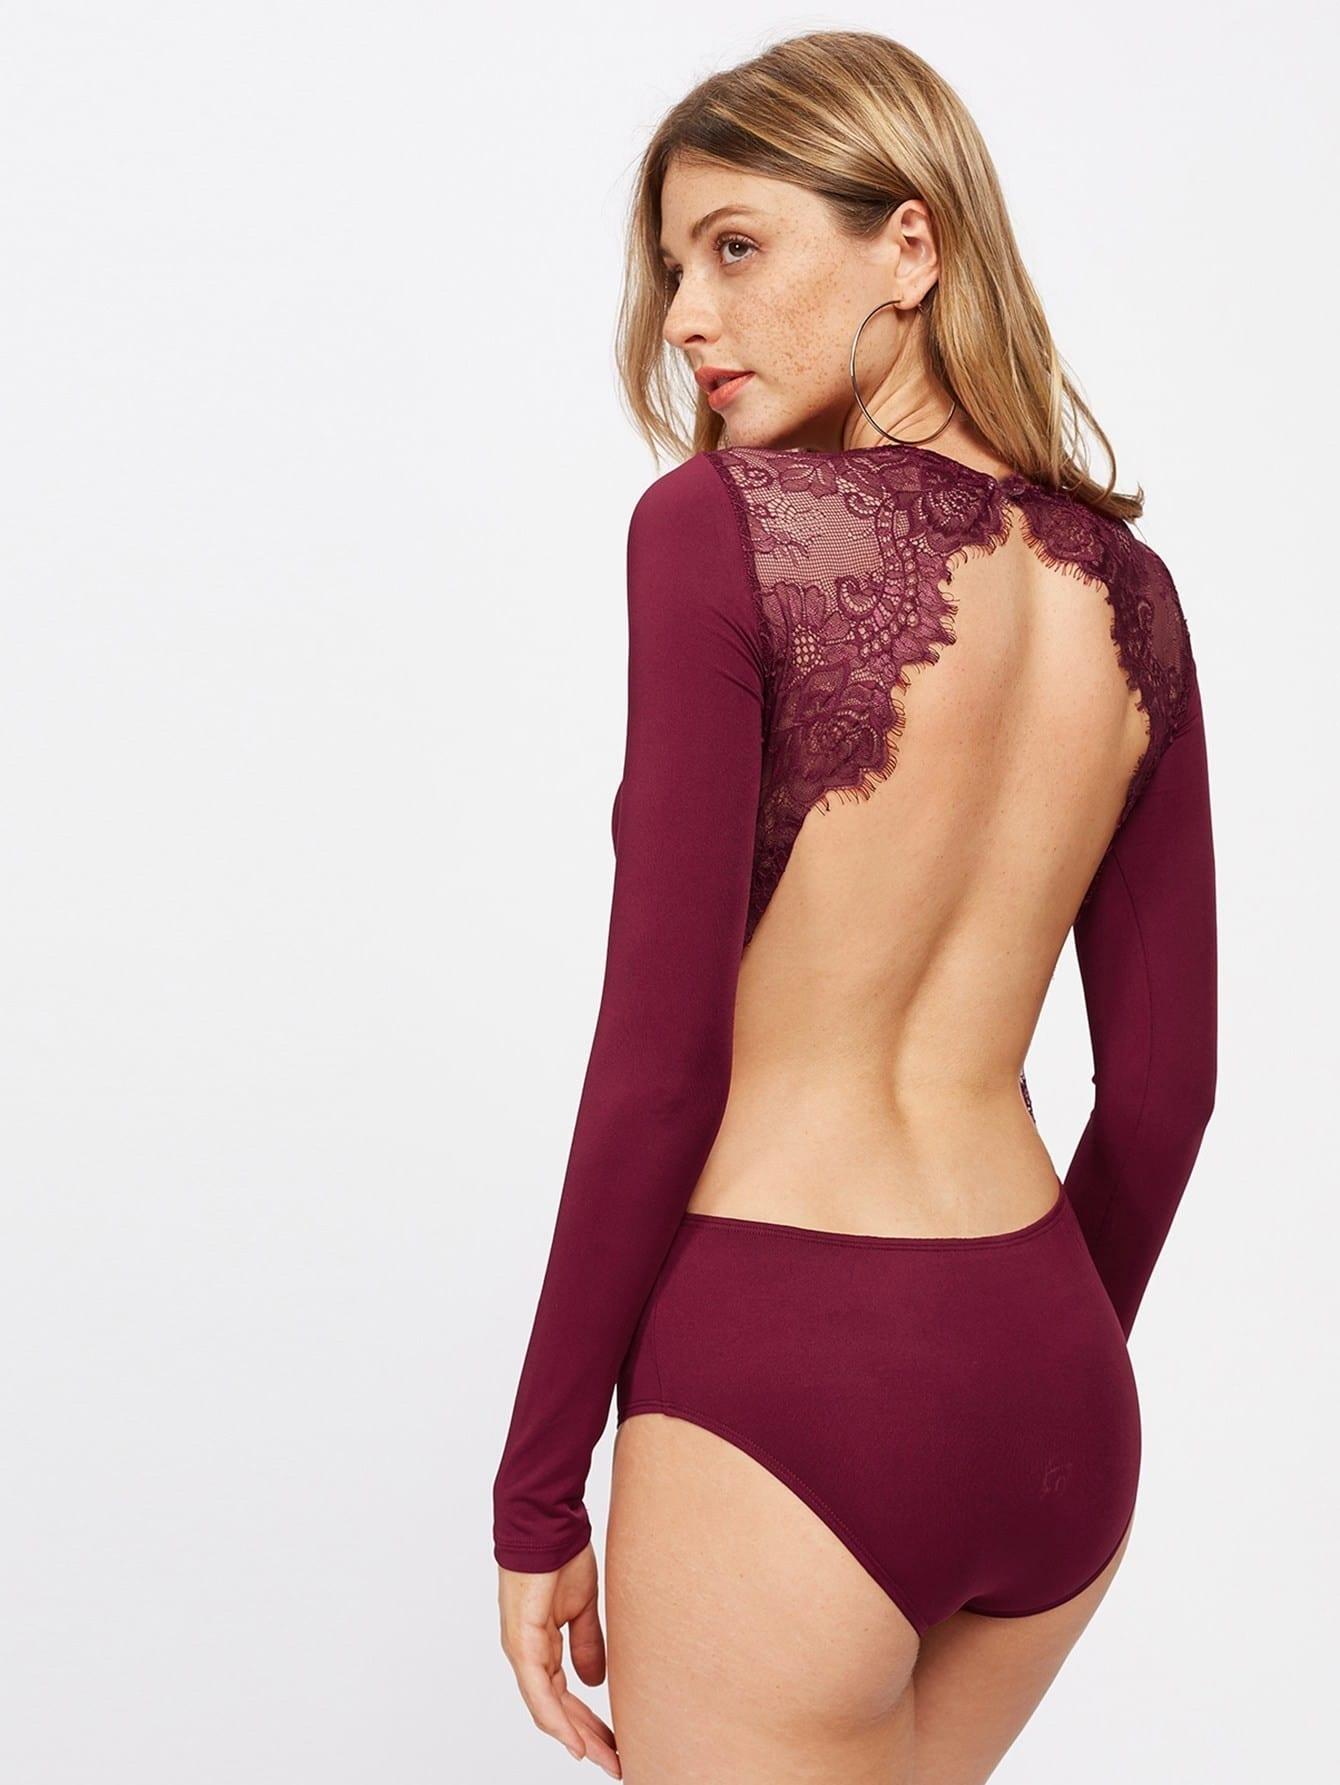 cee4da41a96 Backless Lace Applique Bodysuit EmmaCloth-Women Fast Fashion Online